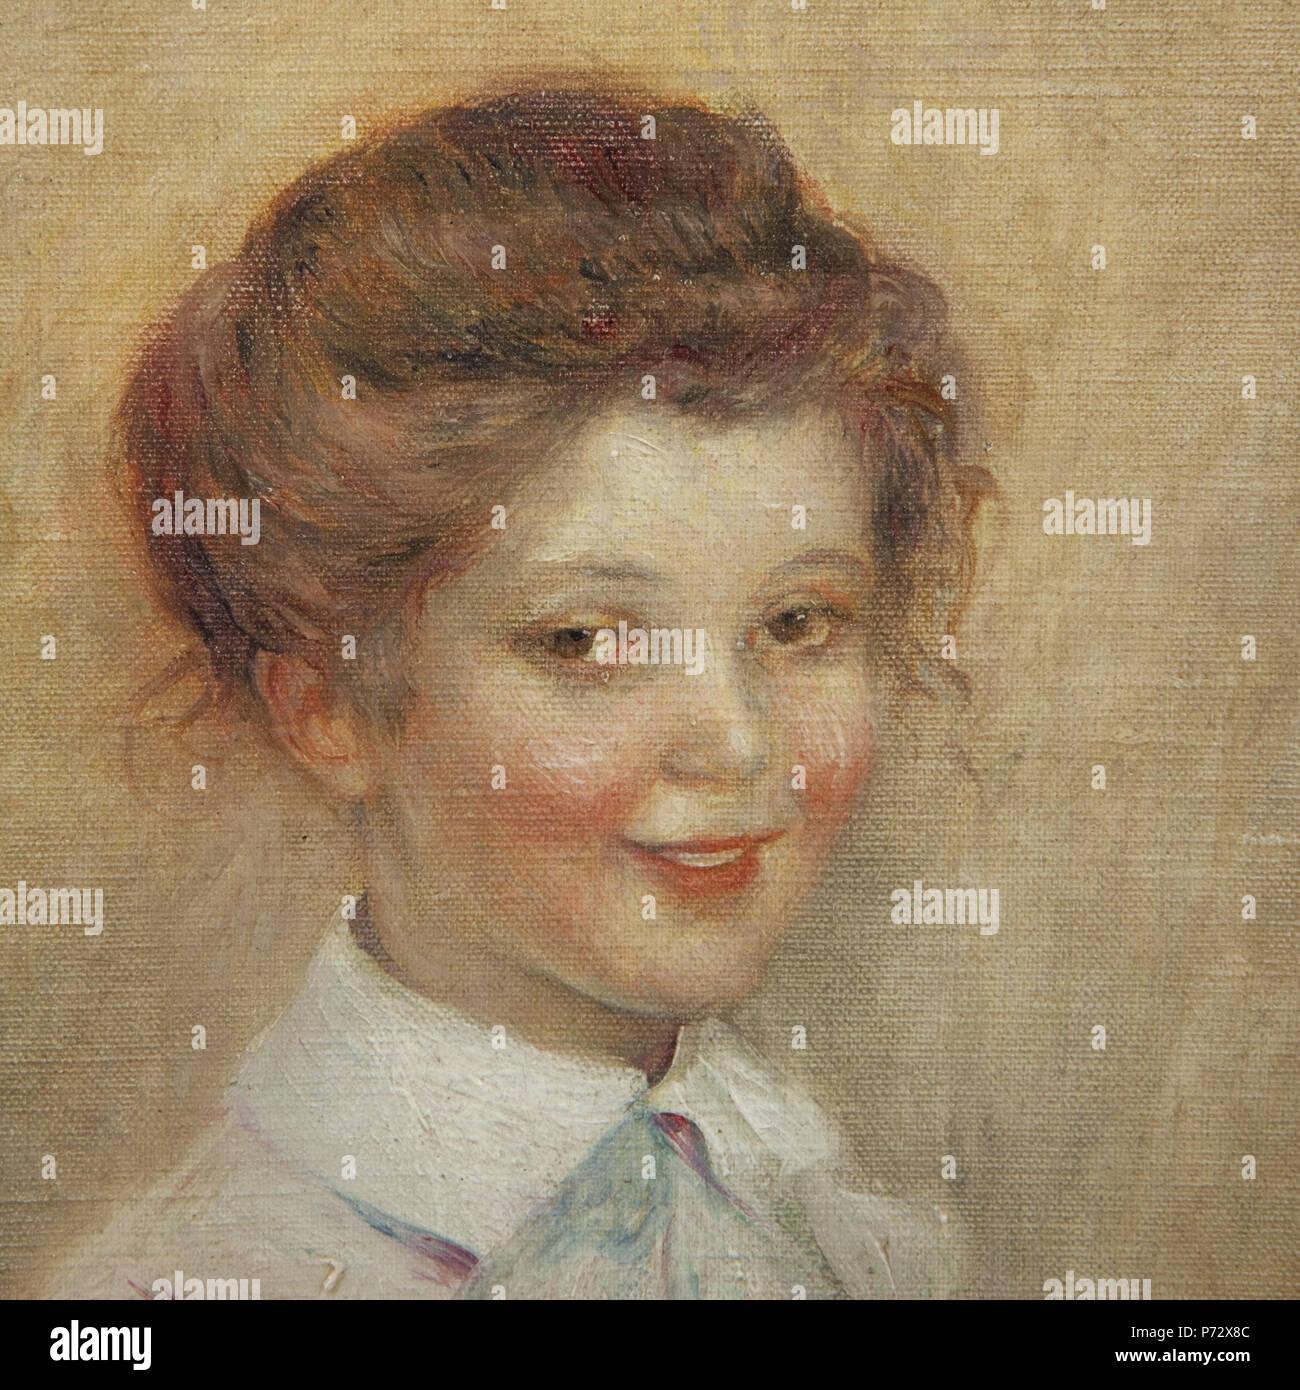 54073a46f1 Inglese: Ritratto d'une jeune fille . 1 gennaio 2016 2 Abel Faivre -